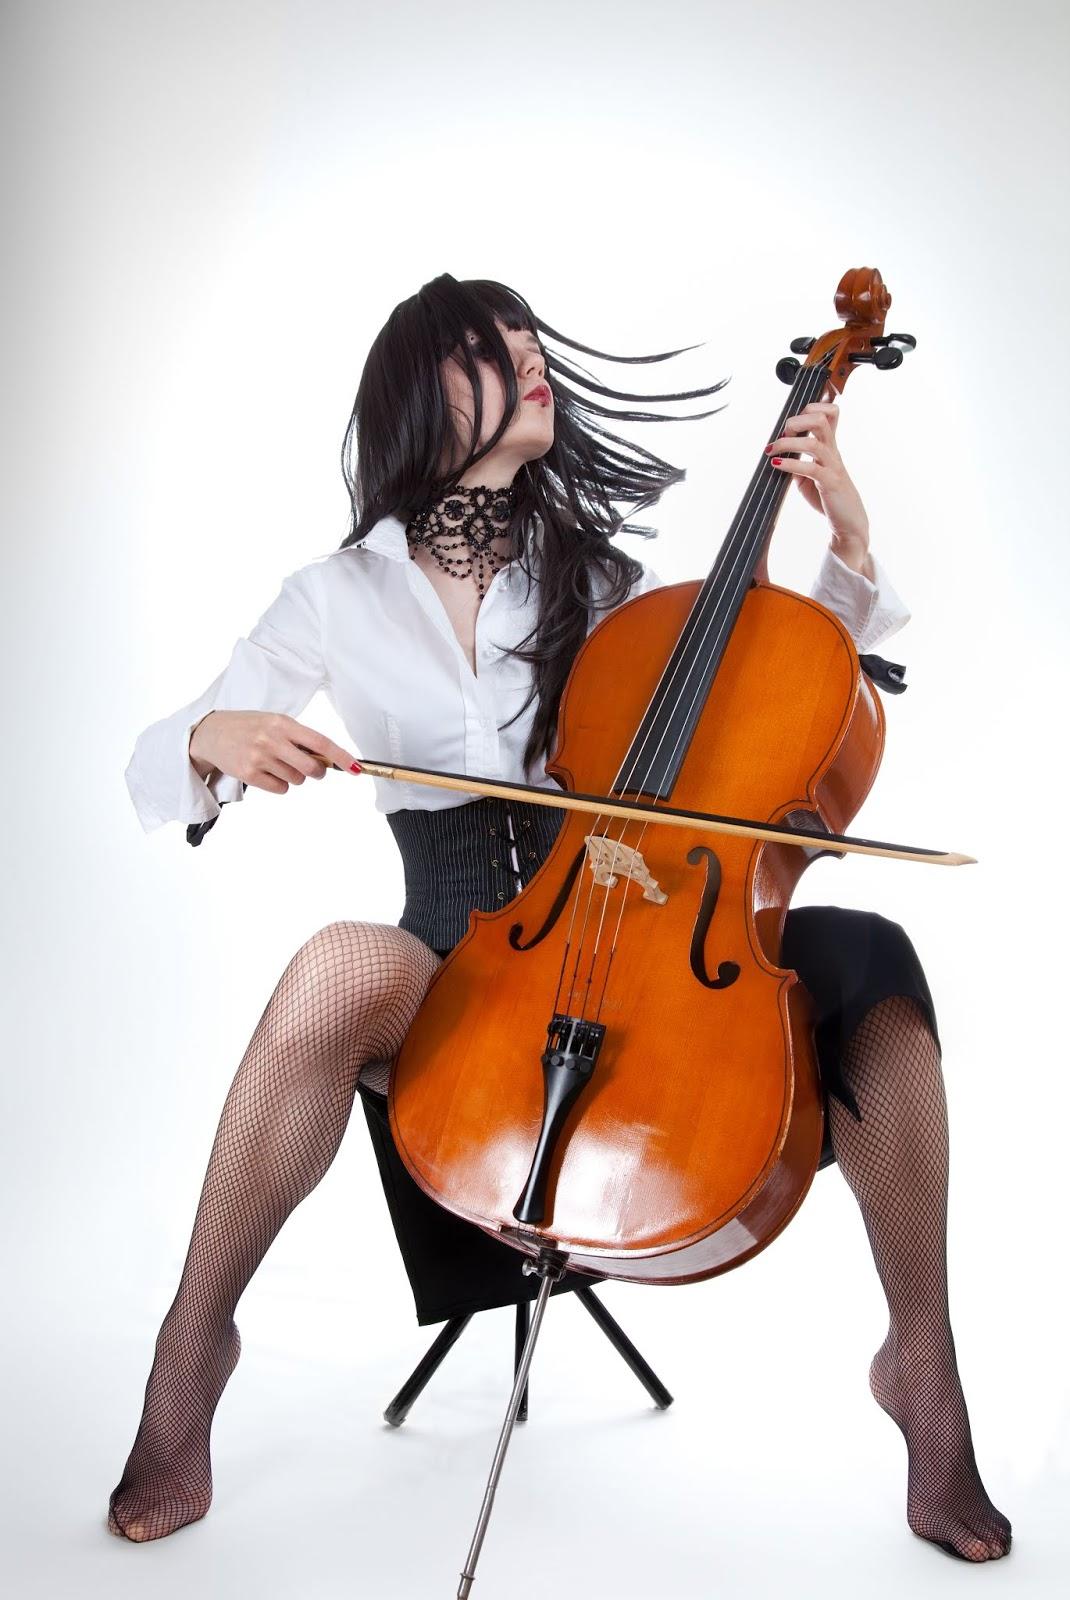 скрипач ленка эро фото - 1